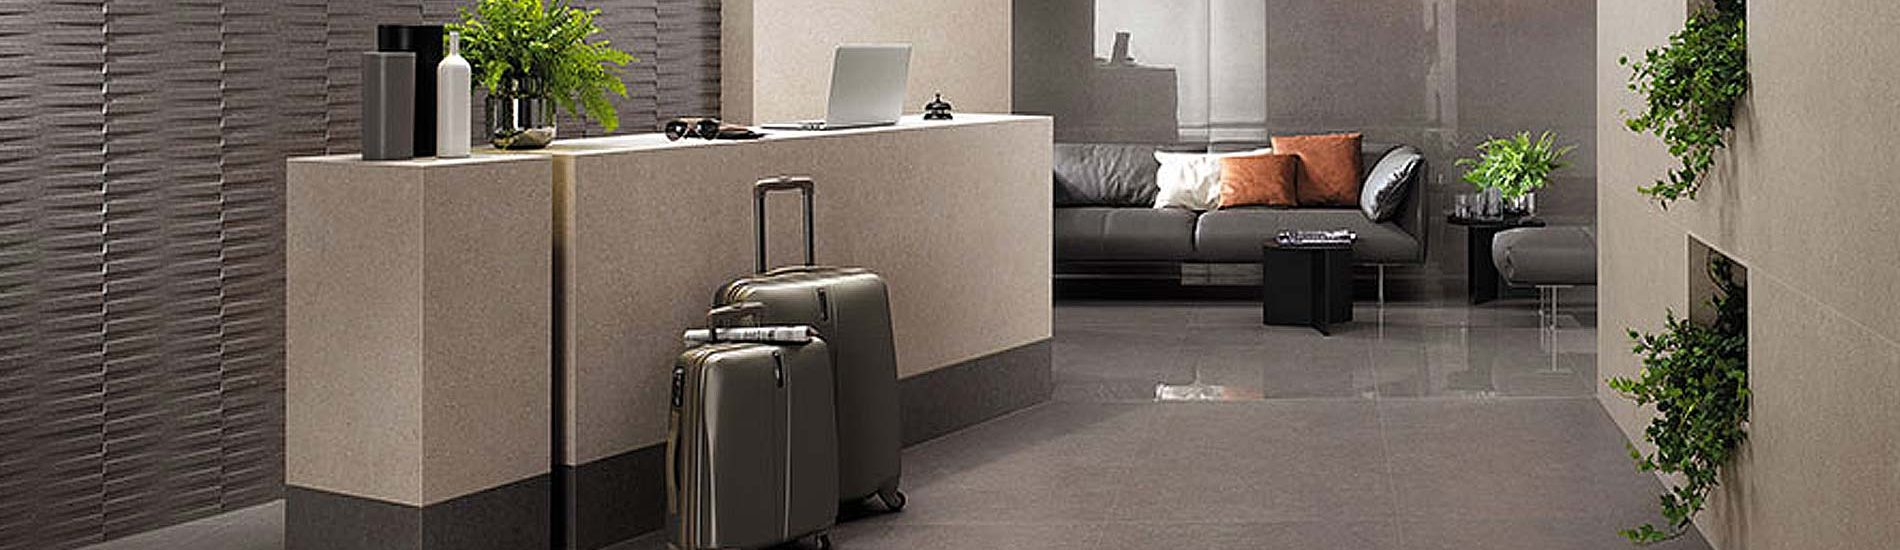 banner-atlas-concorde-kone-stone-look-3d-italian-floor-wall-tile